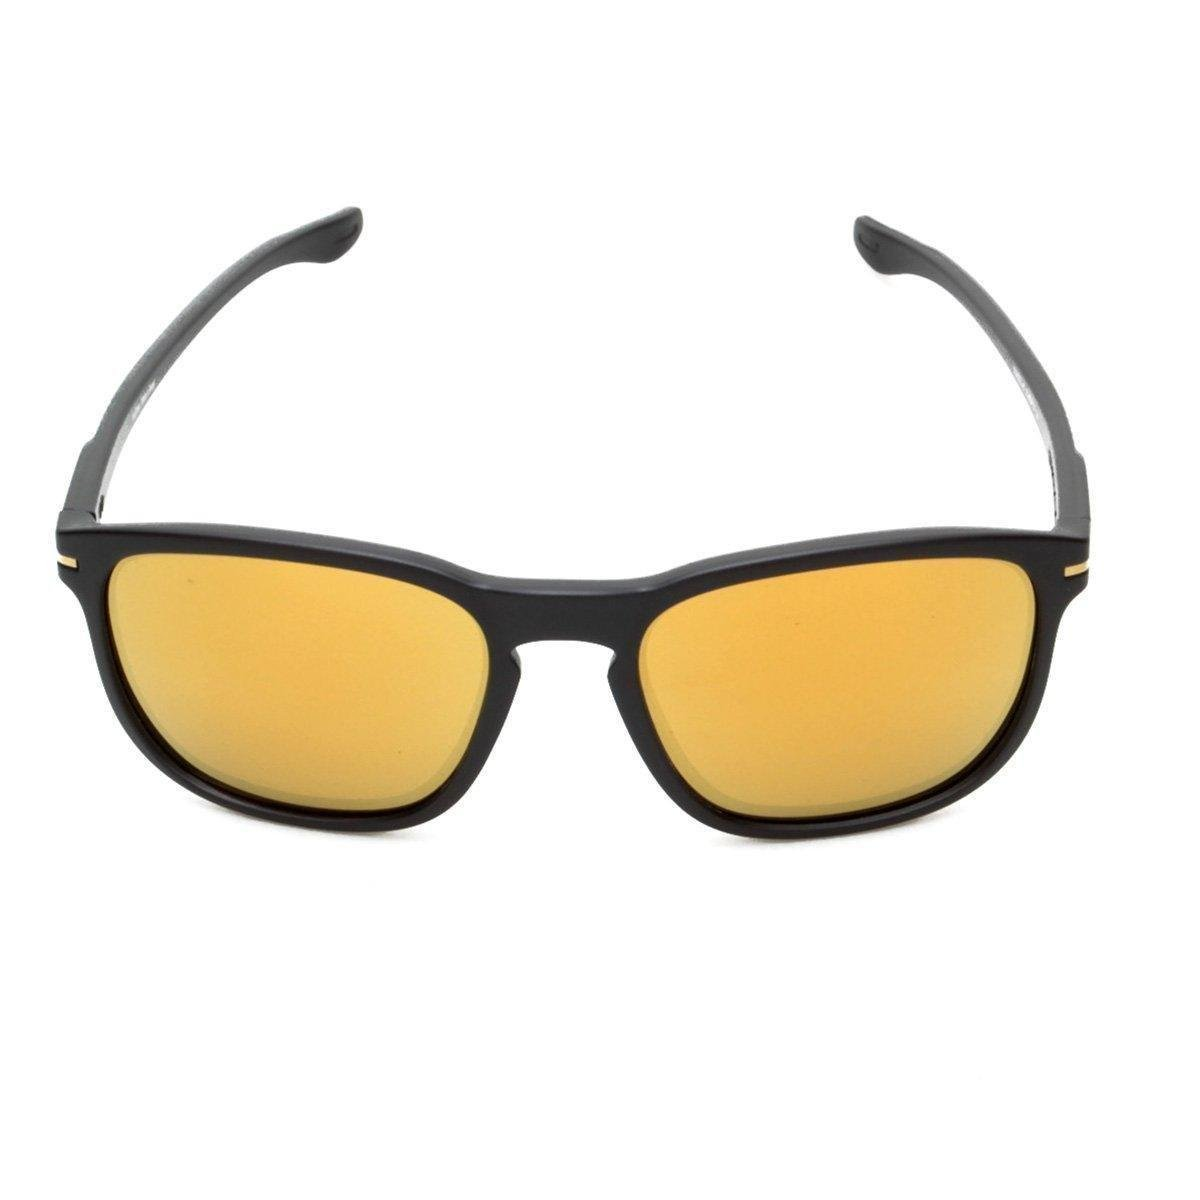 52501a8fe8d93 Óculos Oakley Enduro Iridium  Óculos Oakley Enduro Iridium ...